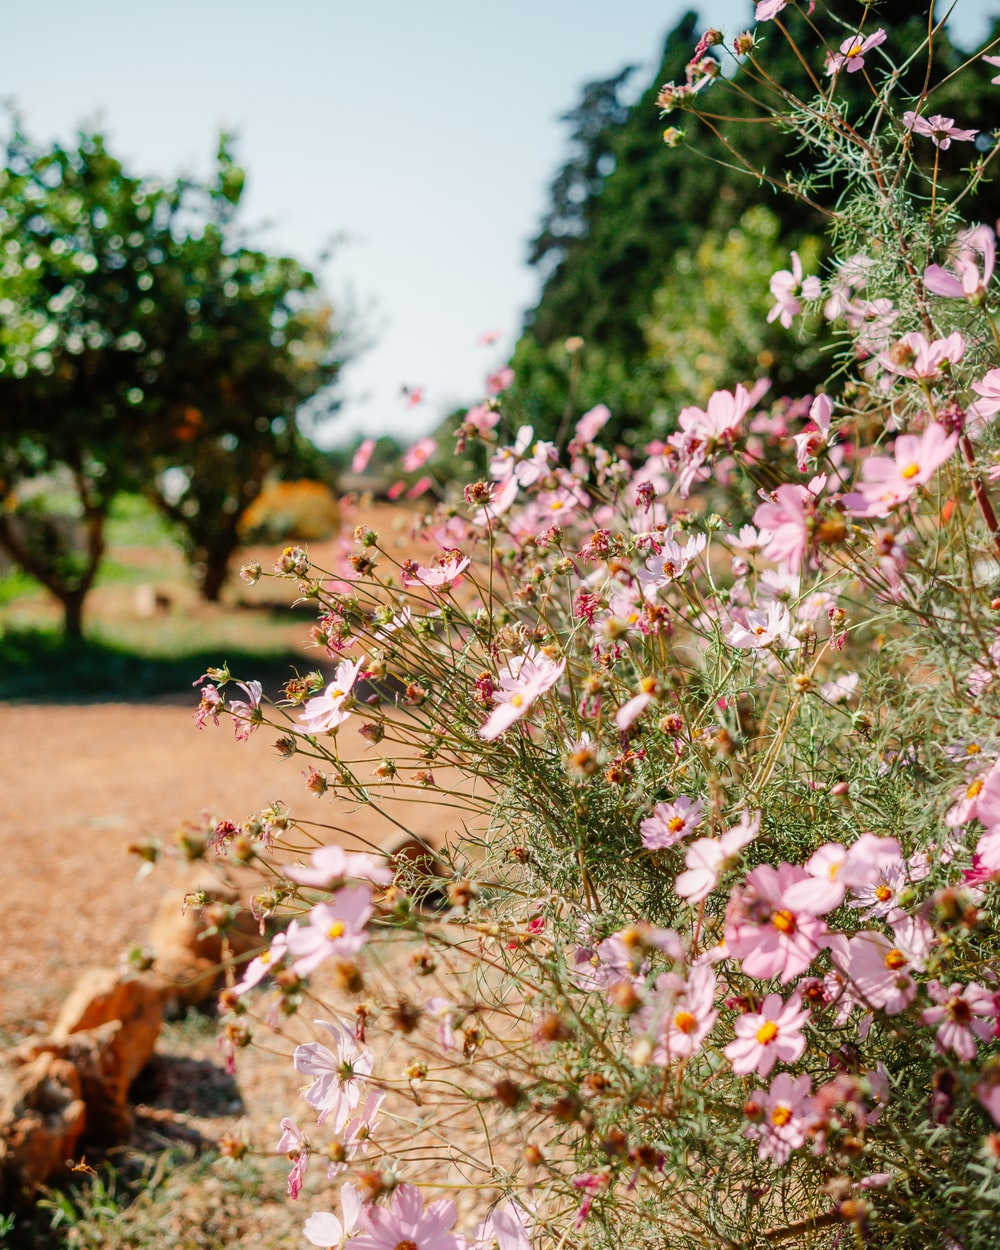 pink flowers on brown soil during daytime